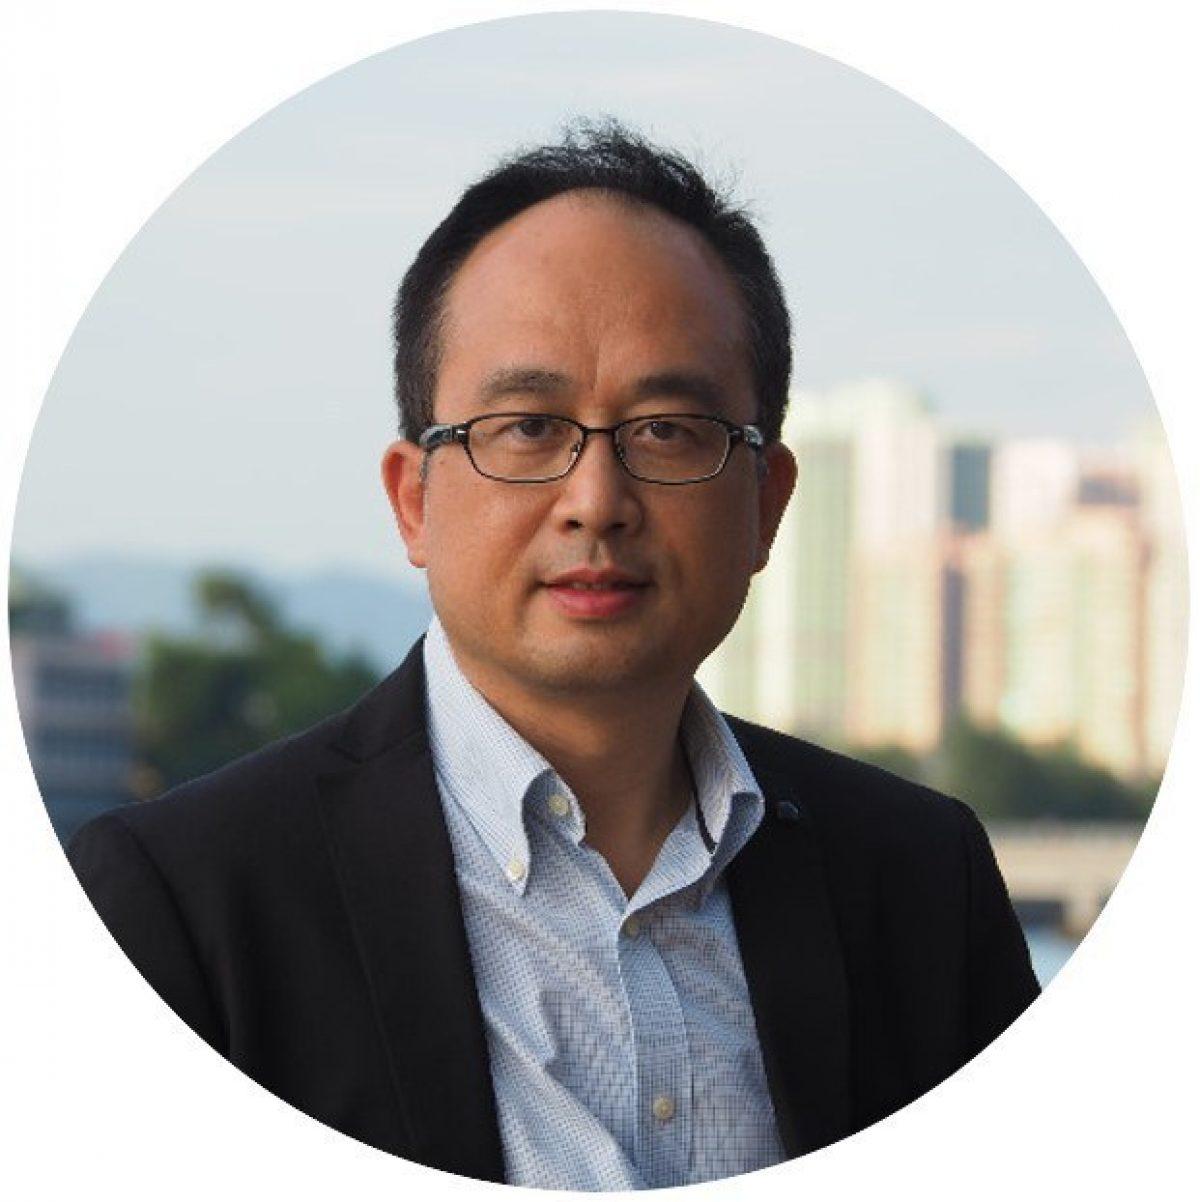 Gary Lam Profile Photo mtime20190809062053